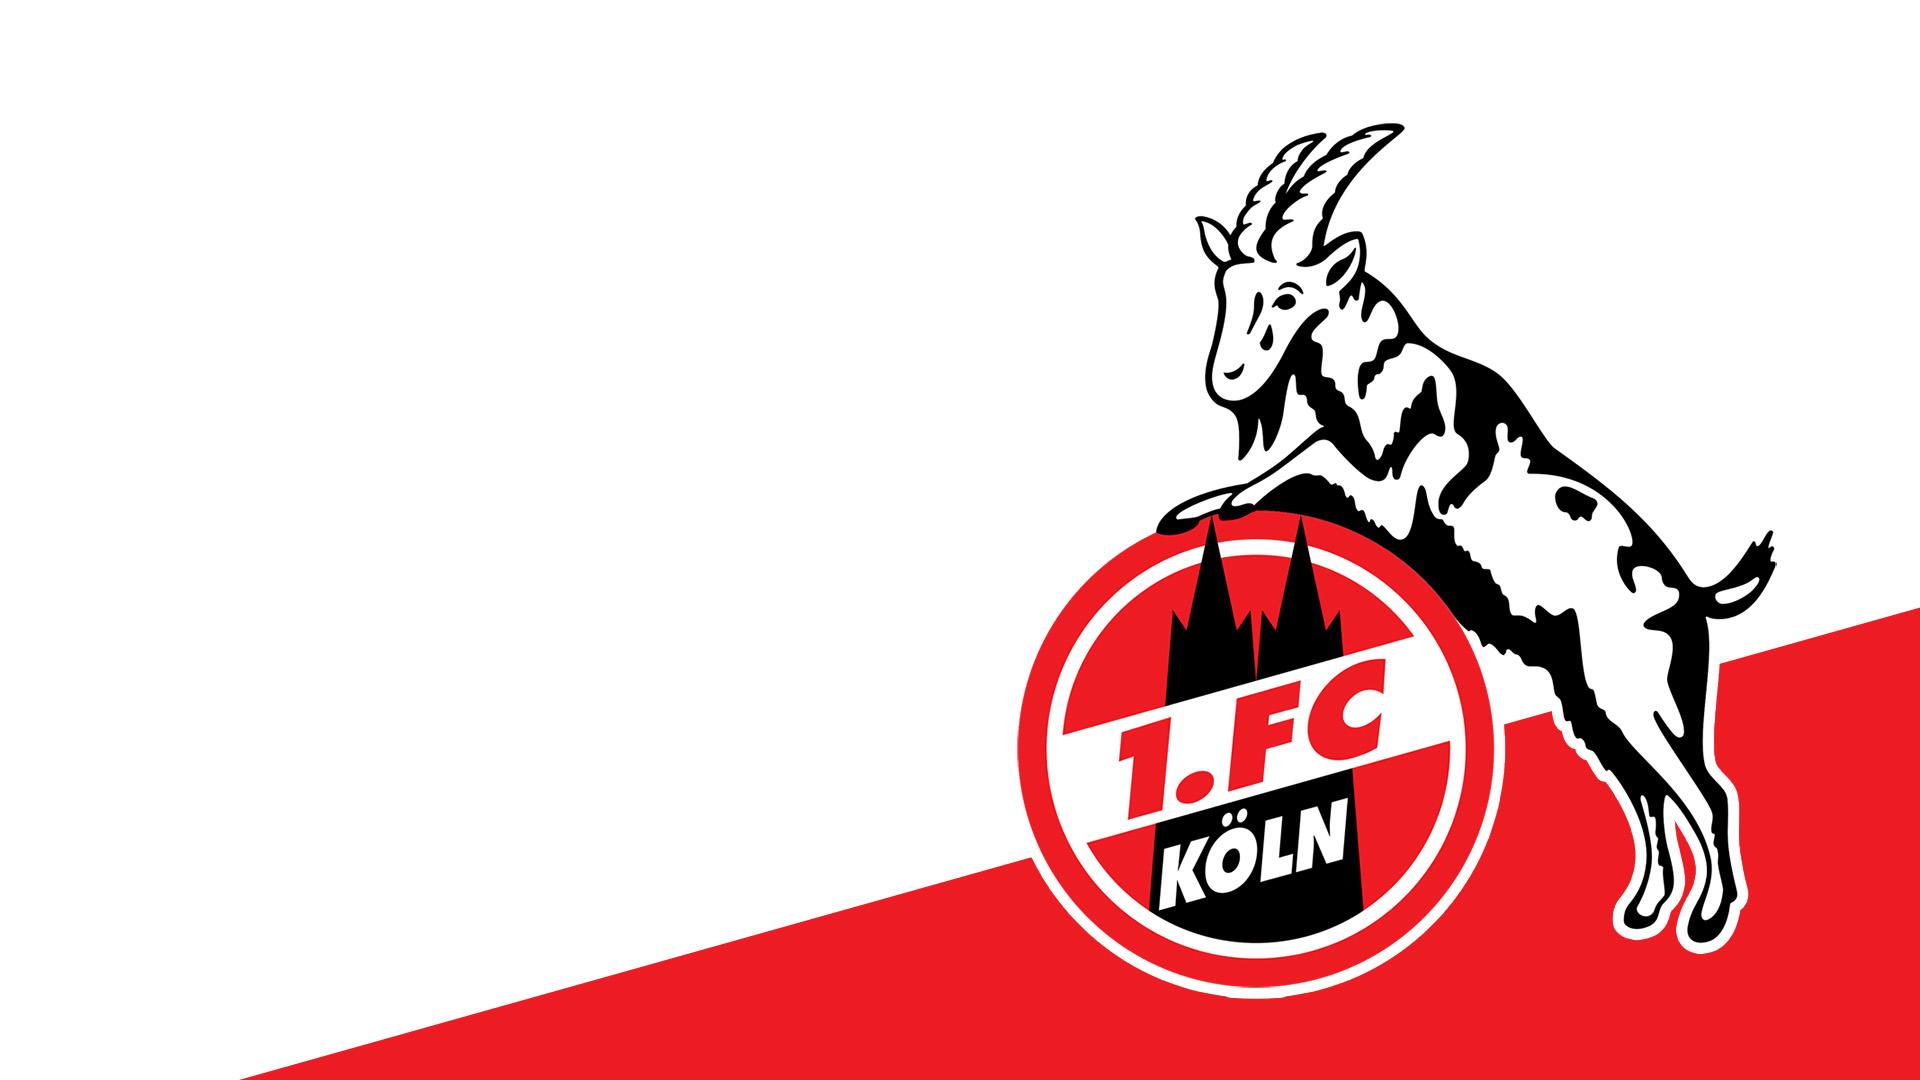 Fc Köln Bilder Kostenlos